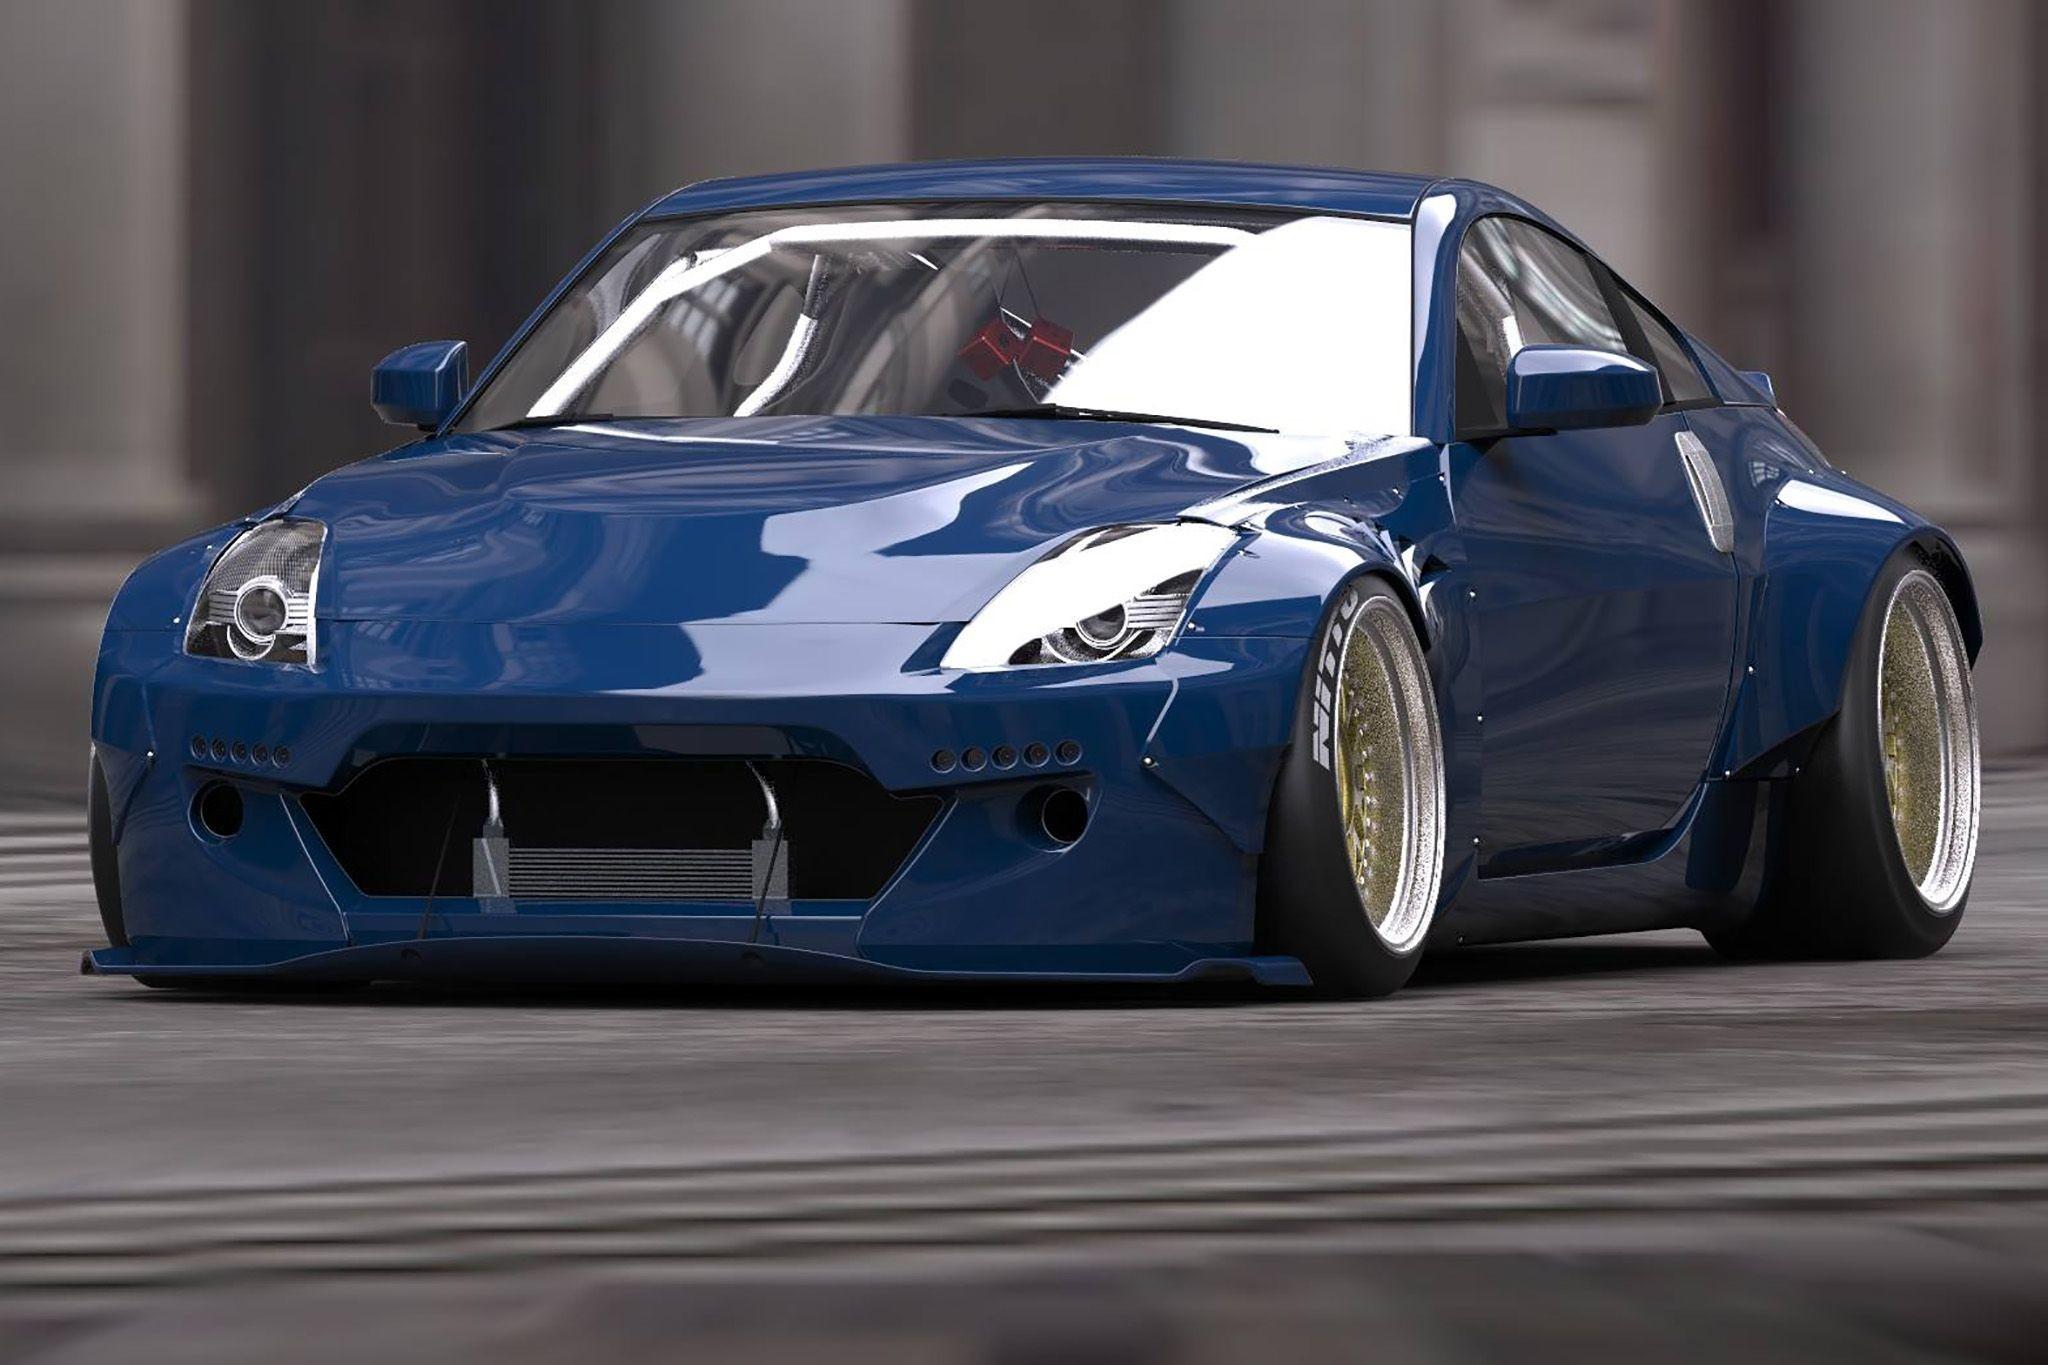 Blue front